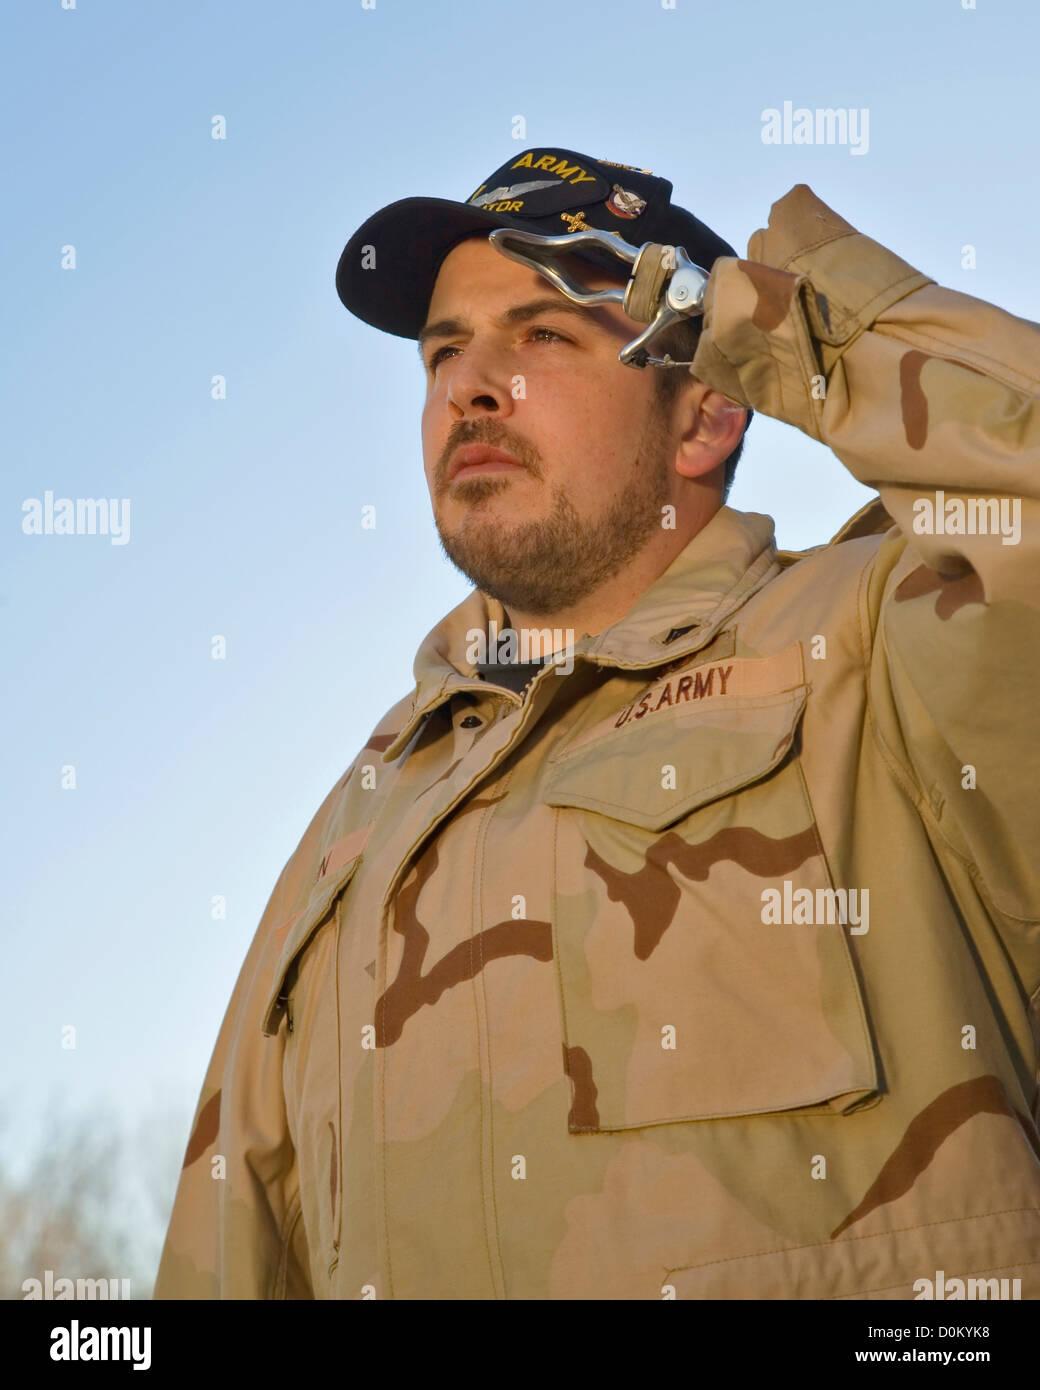 Young Veteran Saluting with Prosthetic Limb - Stock Image